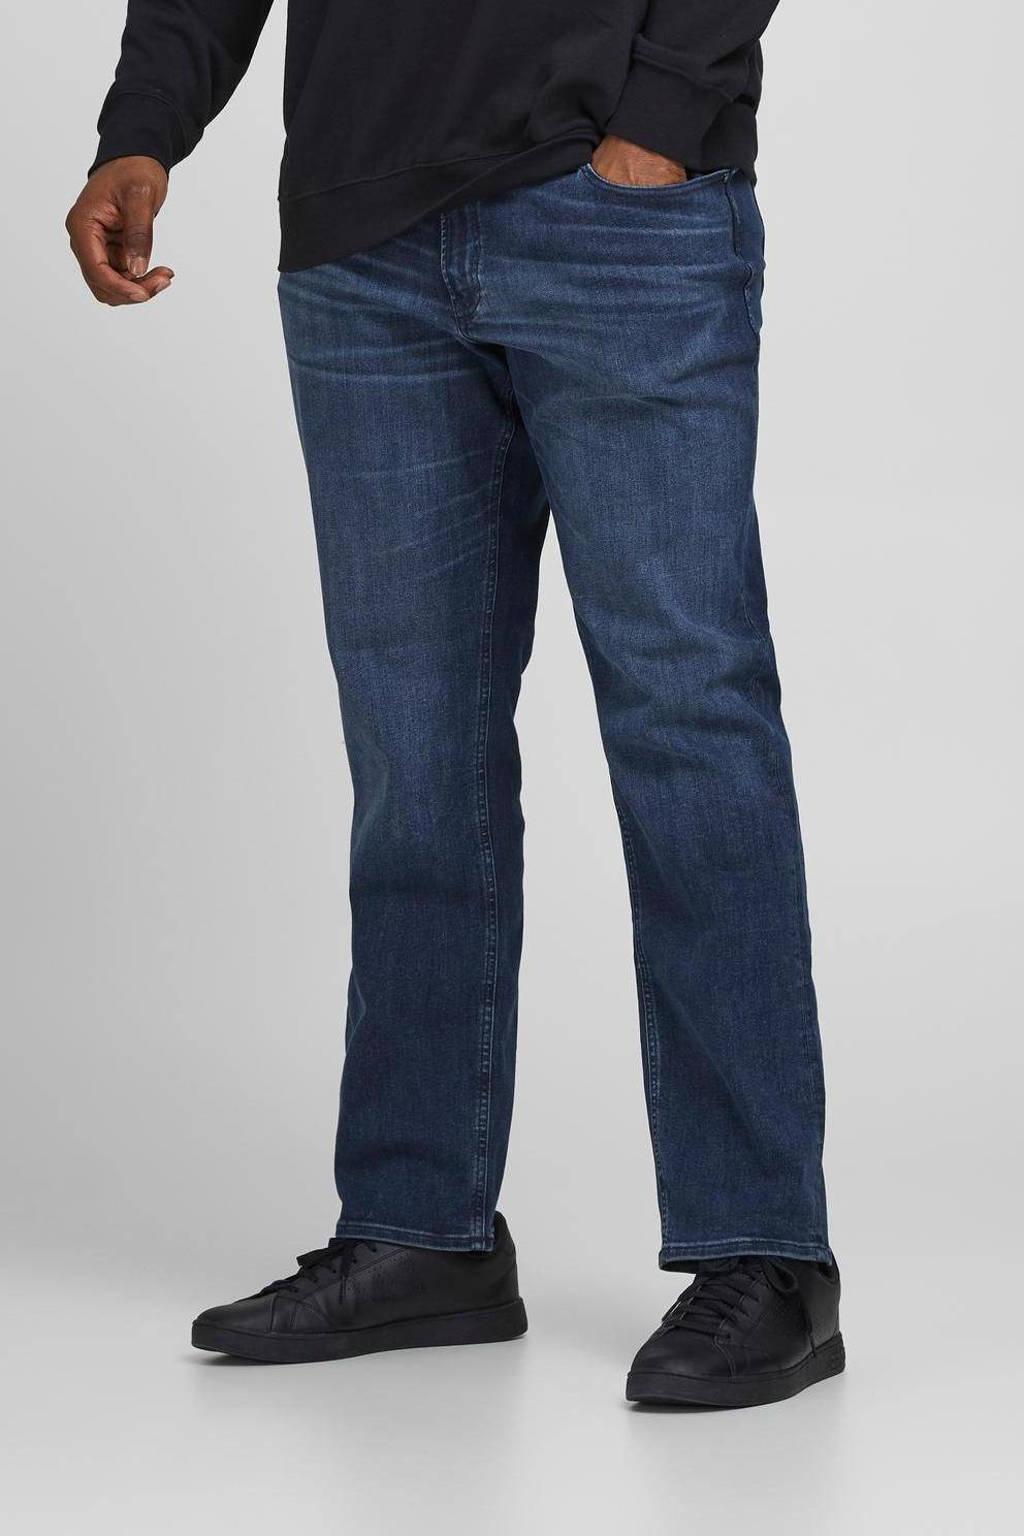 JACK & JONES PLUS SIZE slim fit jeans Glenn Originals Plus Size blue denim, Blue denim